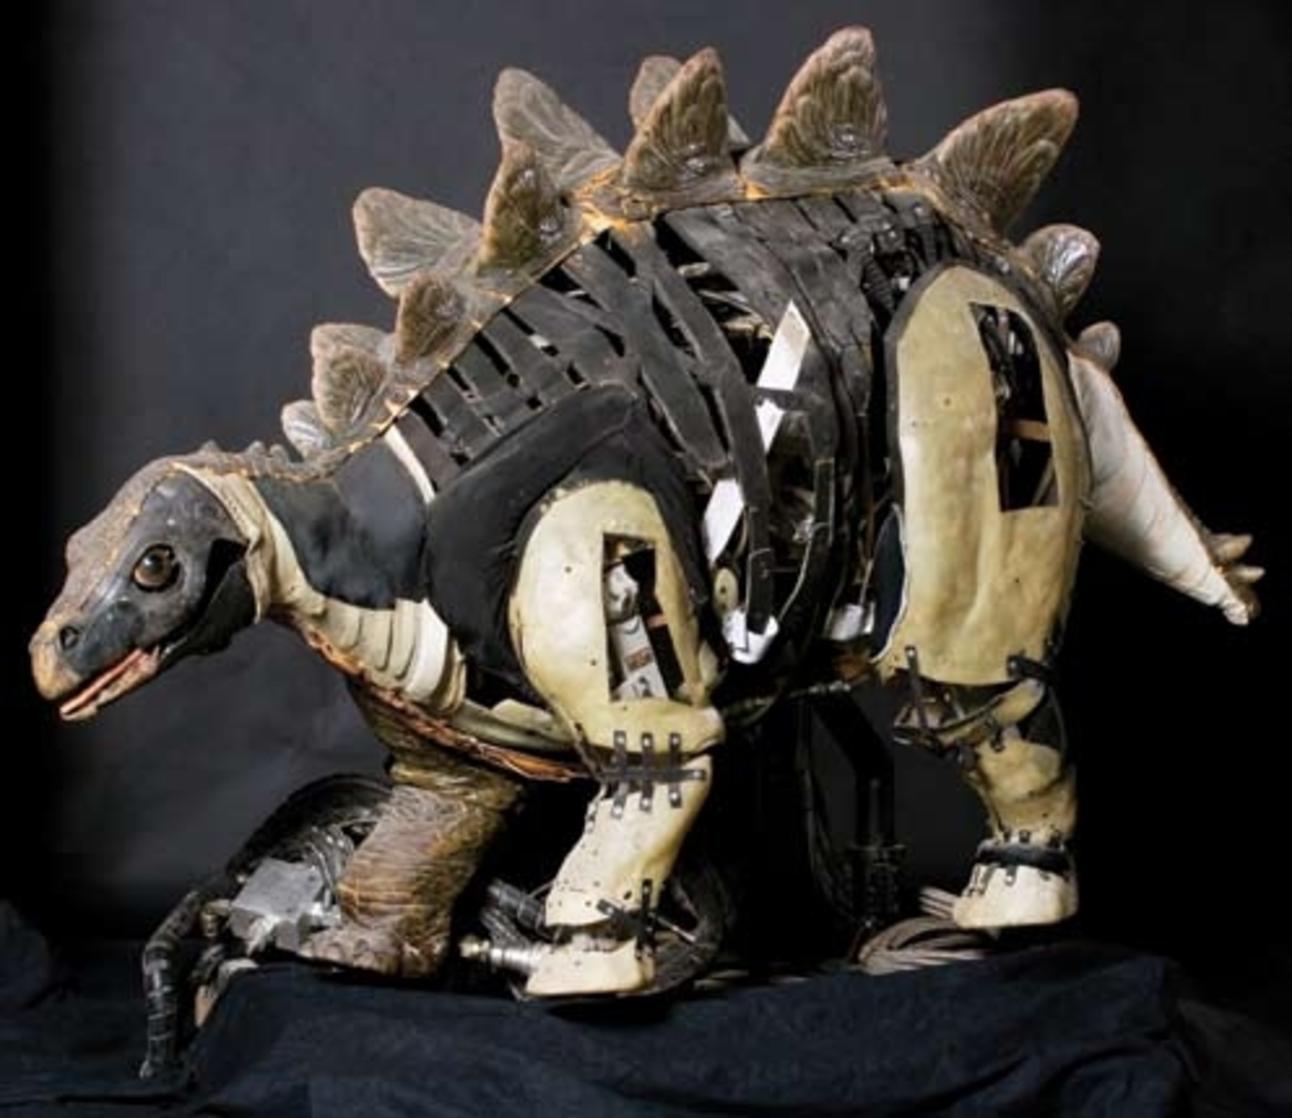 Jurassic Park hydraulic baby Stegosaurus